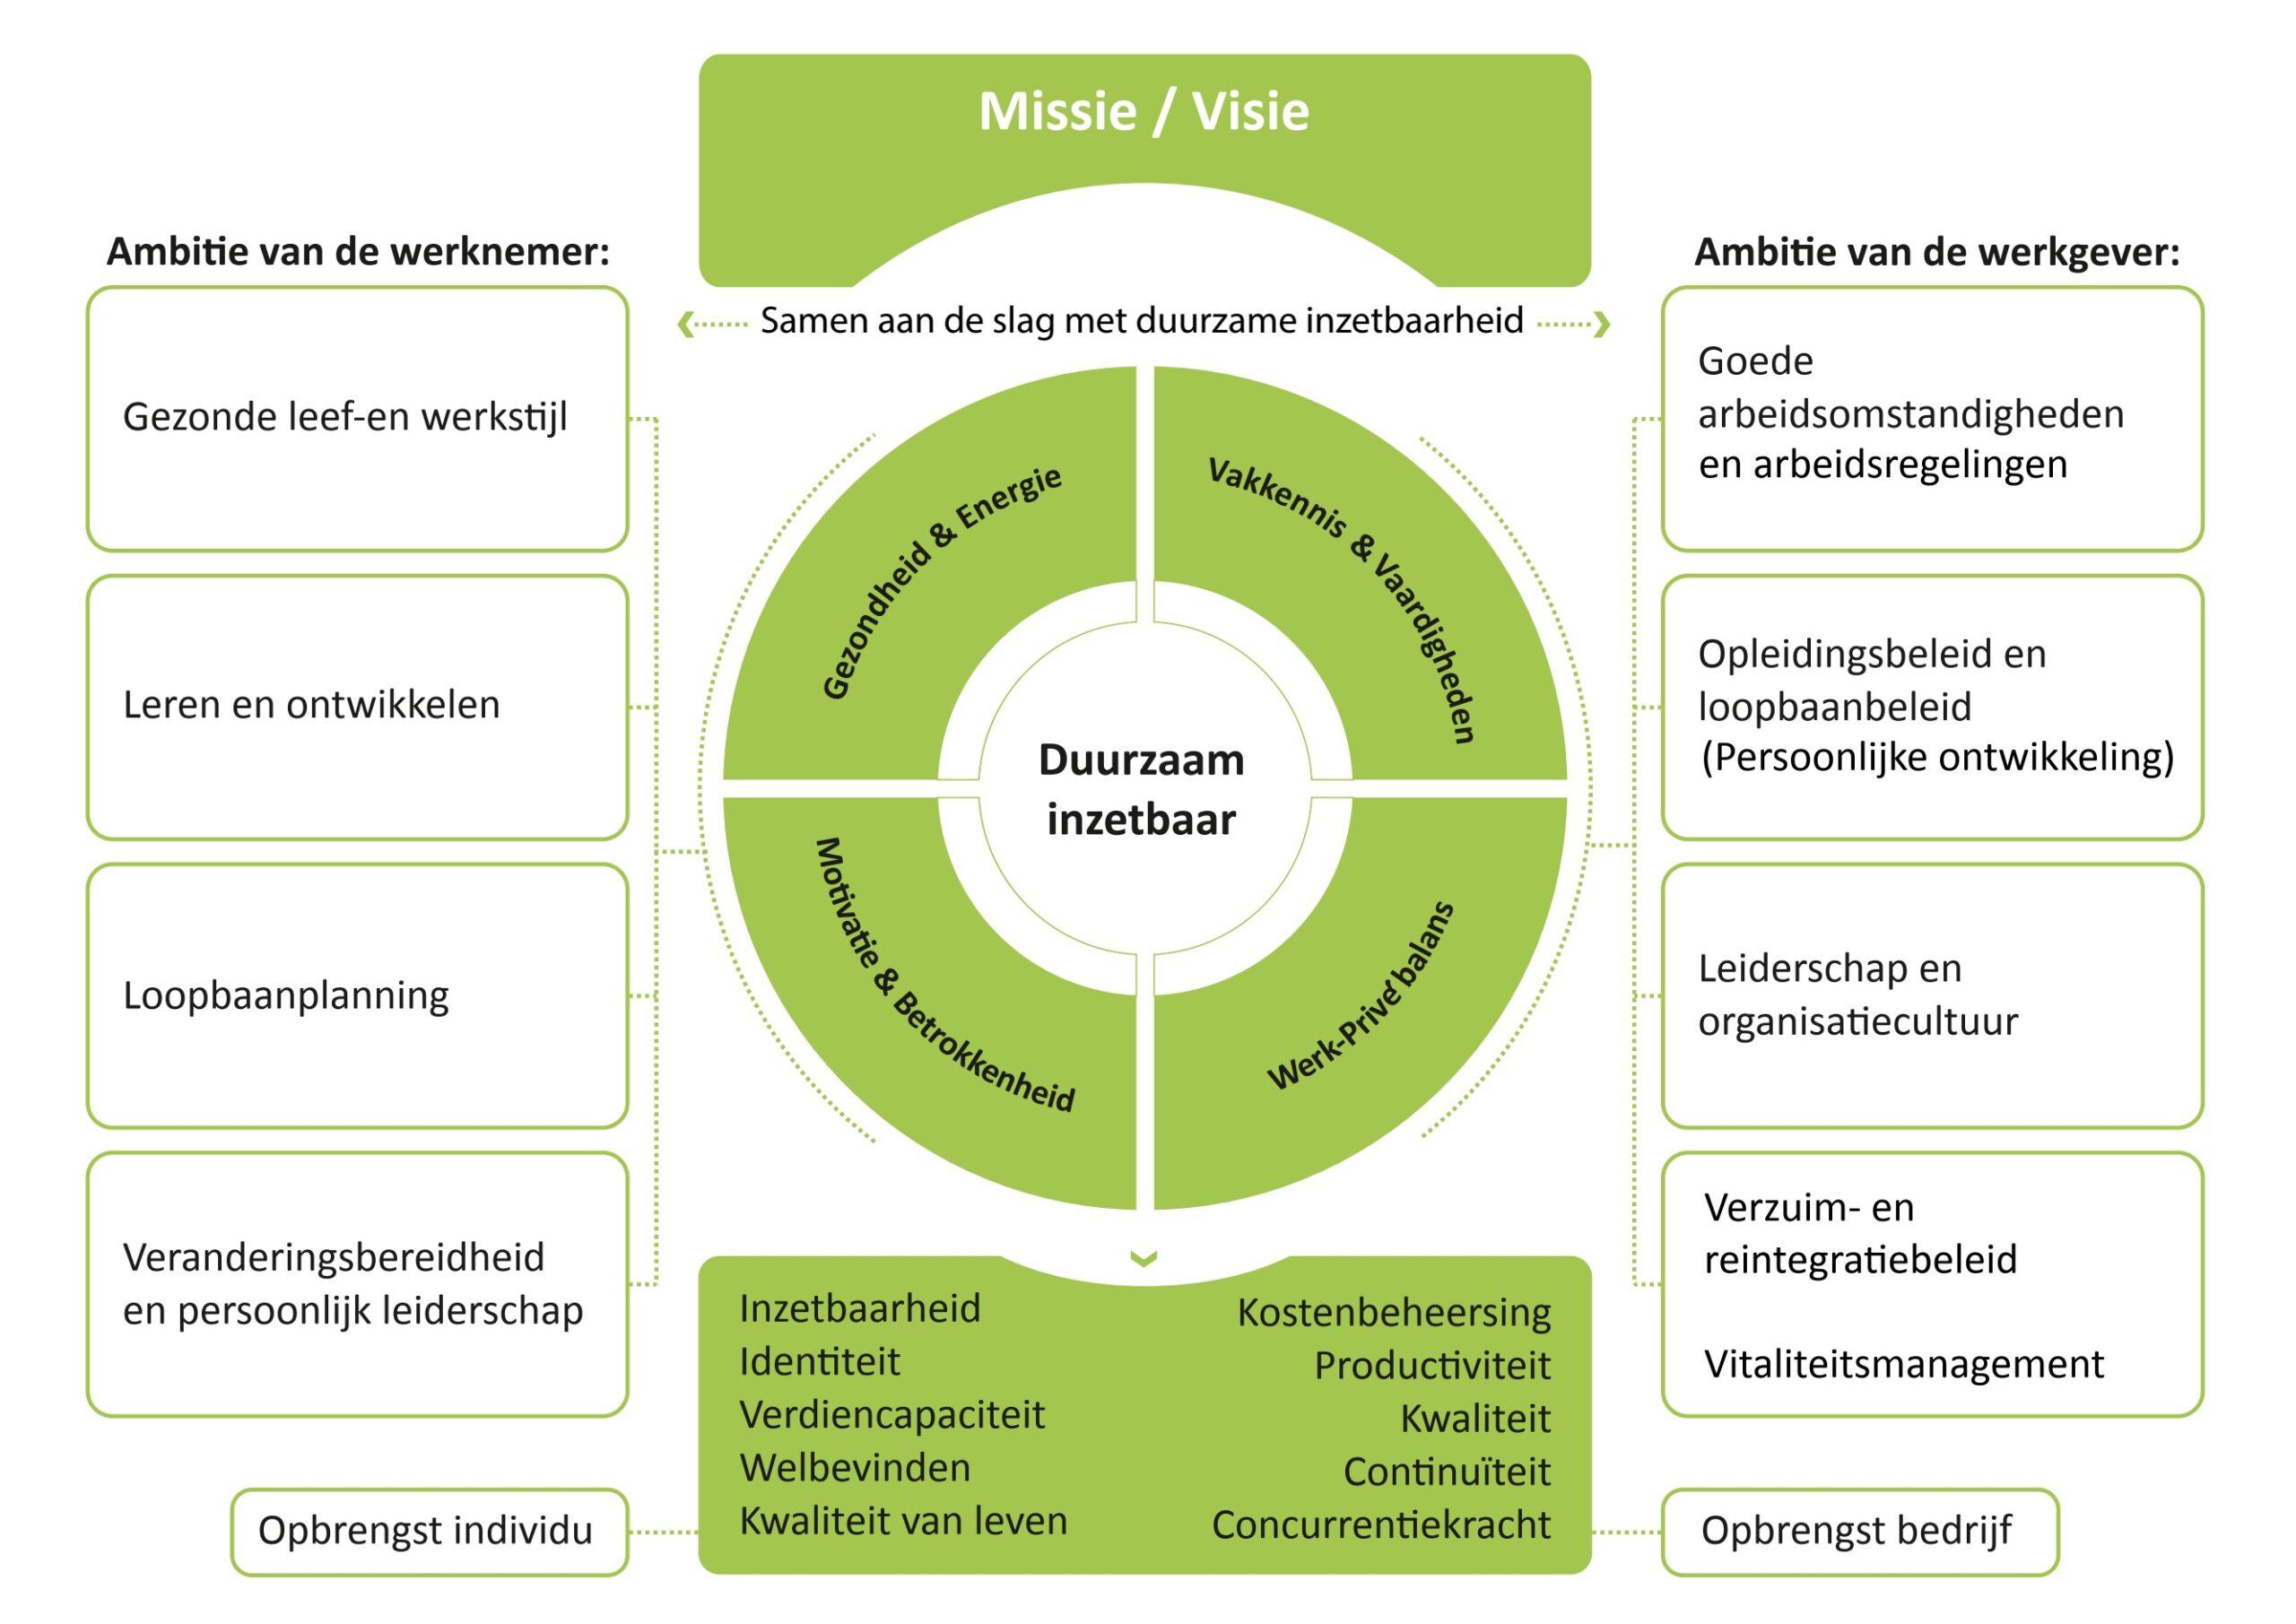 Missie visie diagram duurzame inzetbaarheid ambitie werknemer werkgever